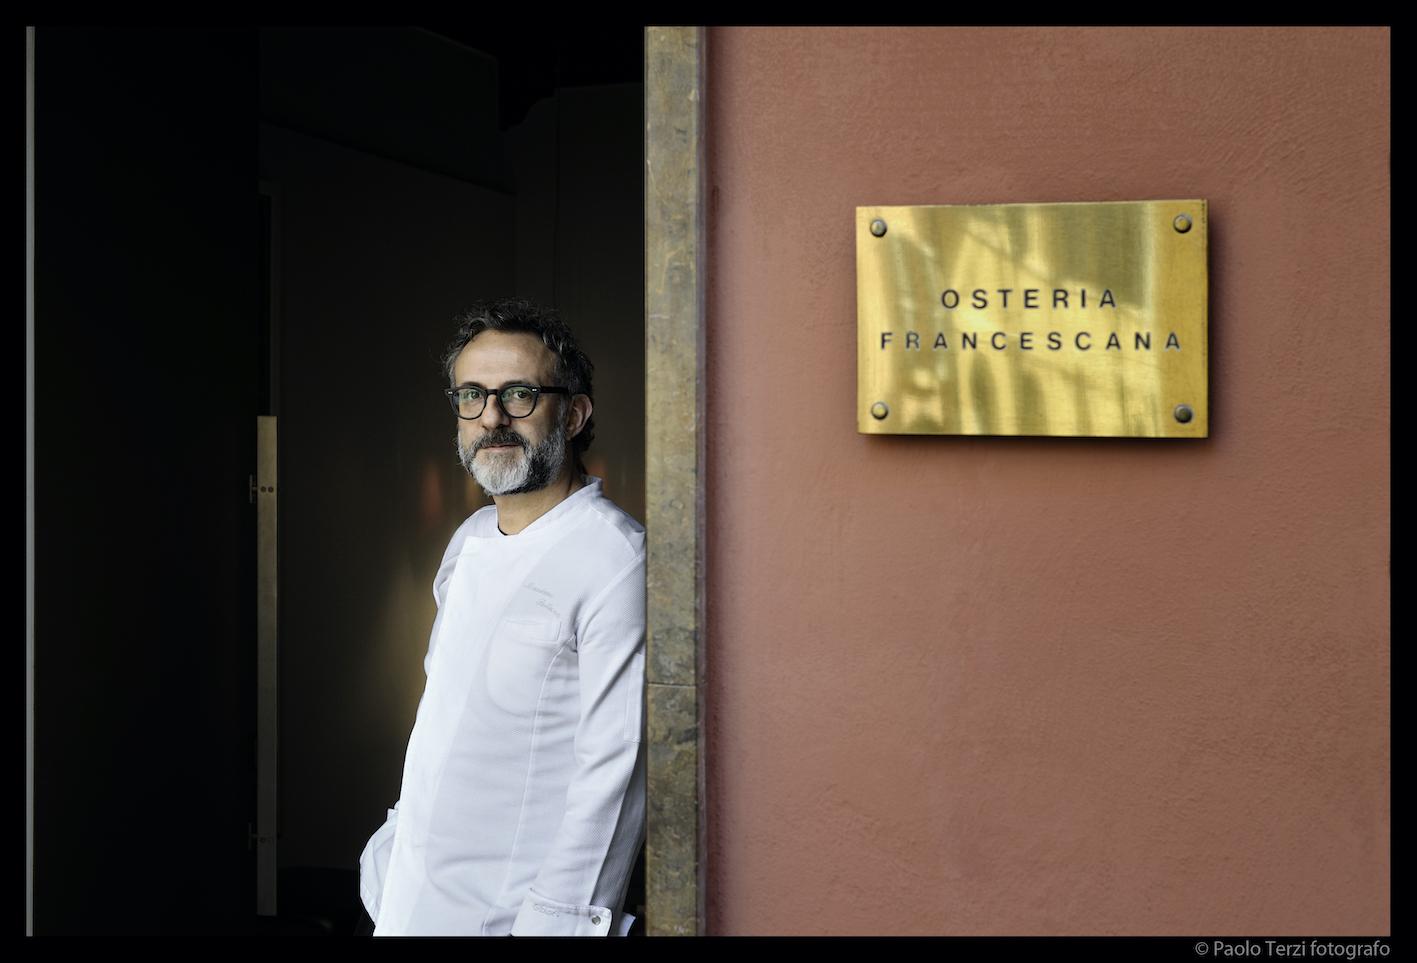 Massimo Bottura2 credits PAOLO TERZI 14. Juni 2021